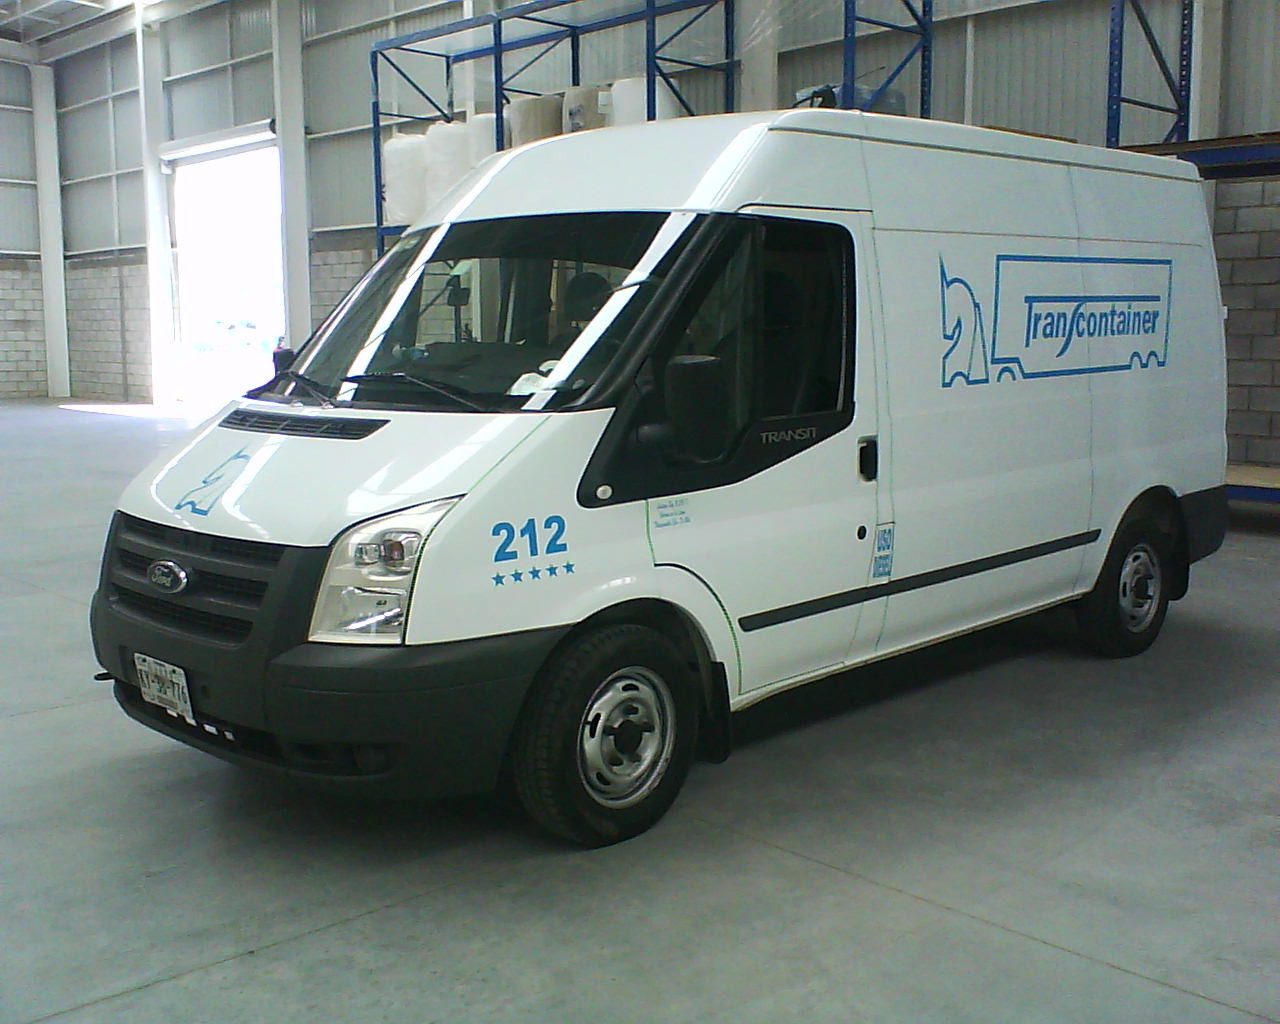 DSC00270.JPG